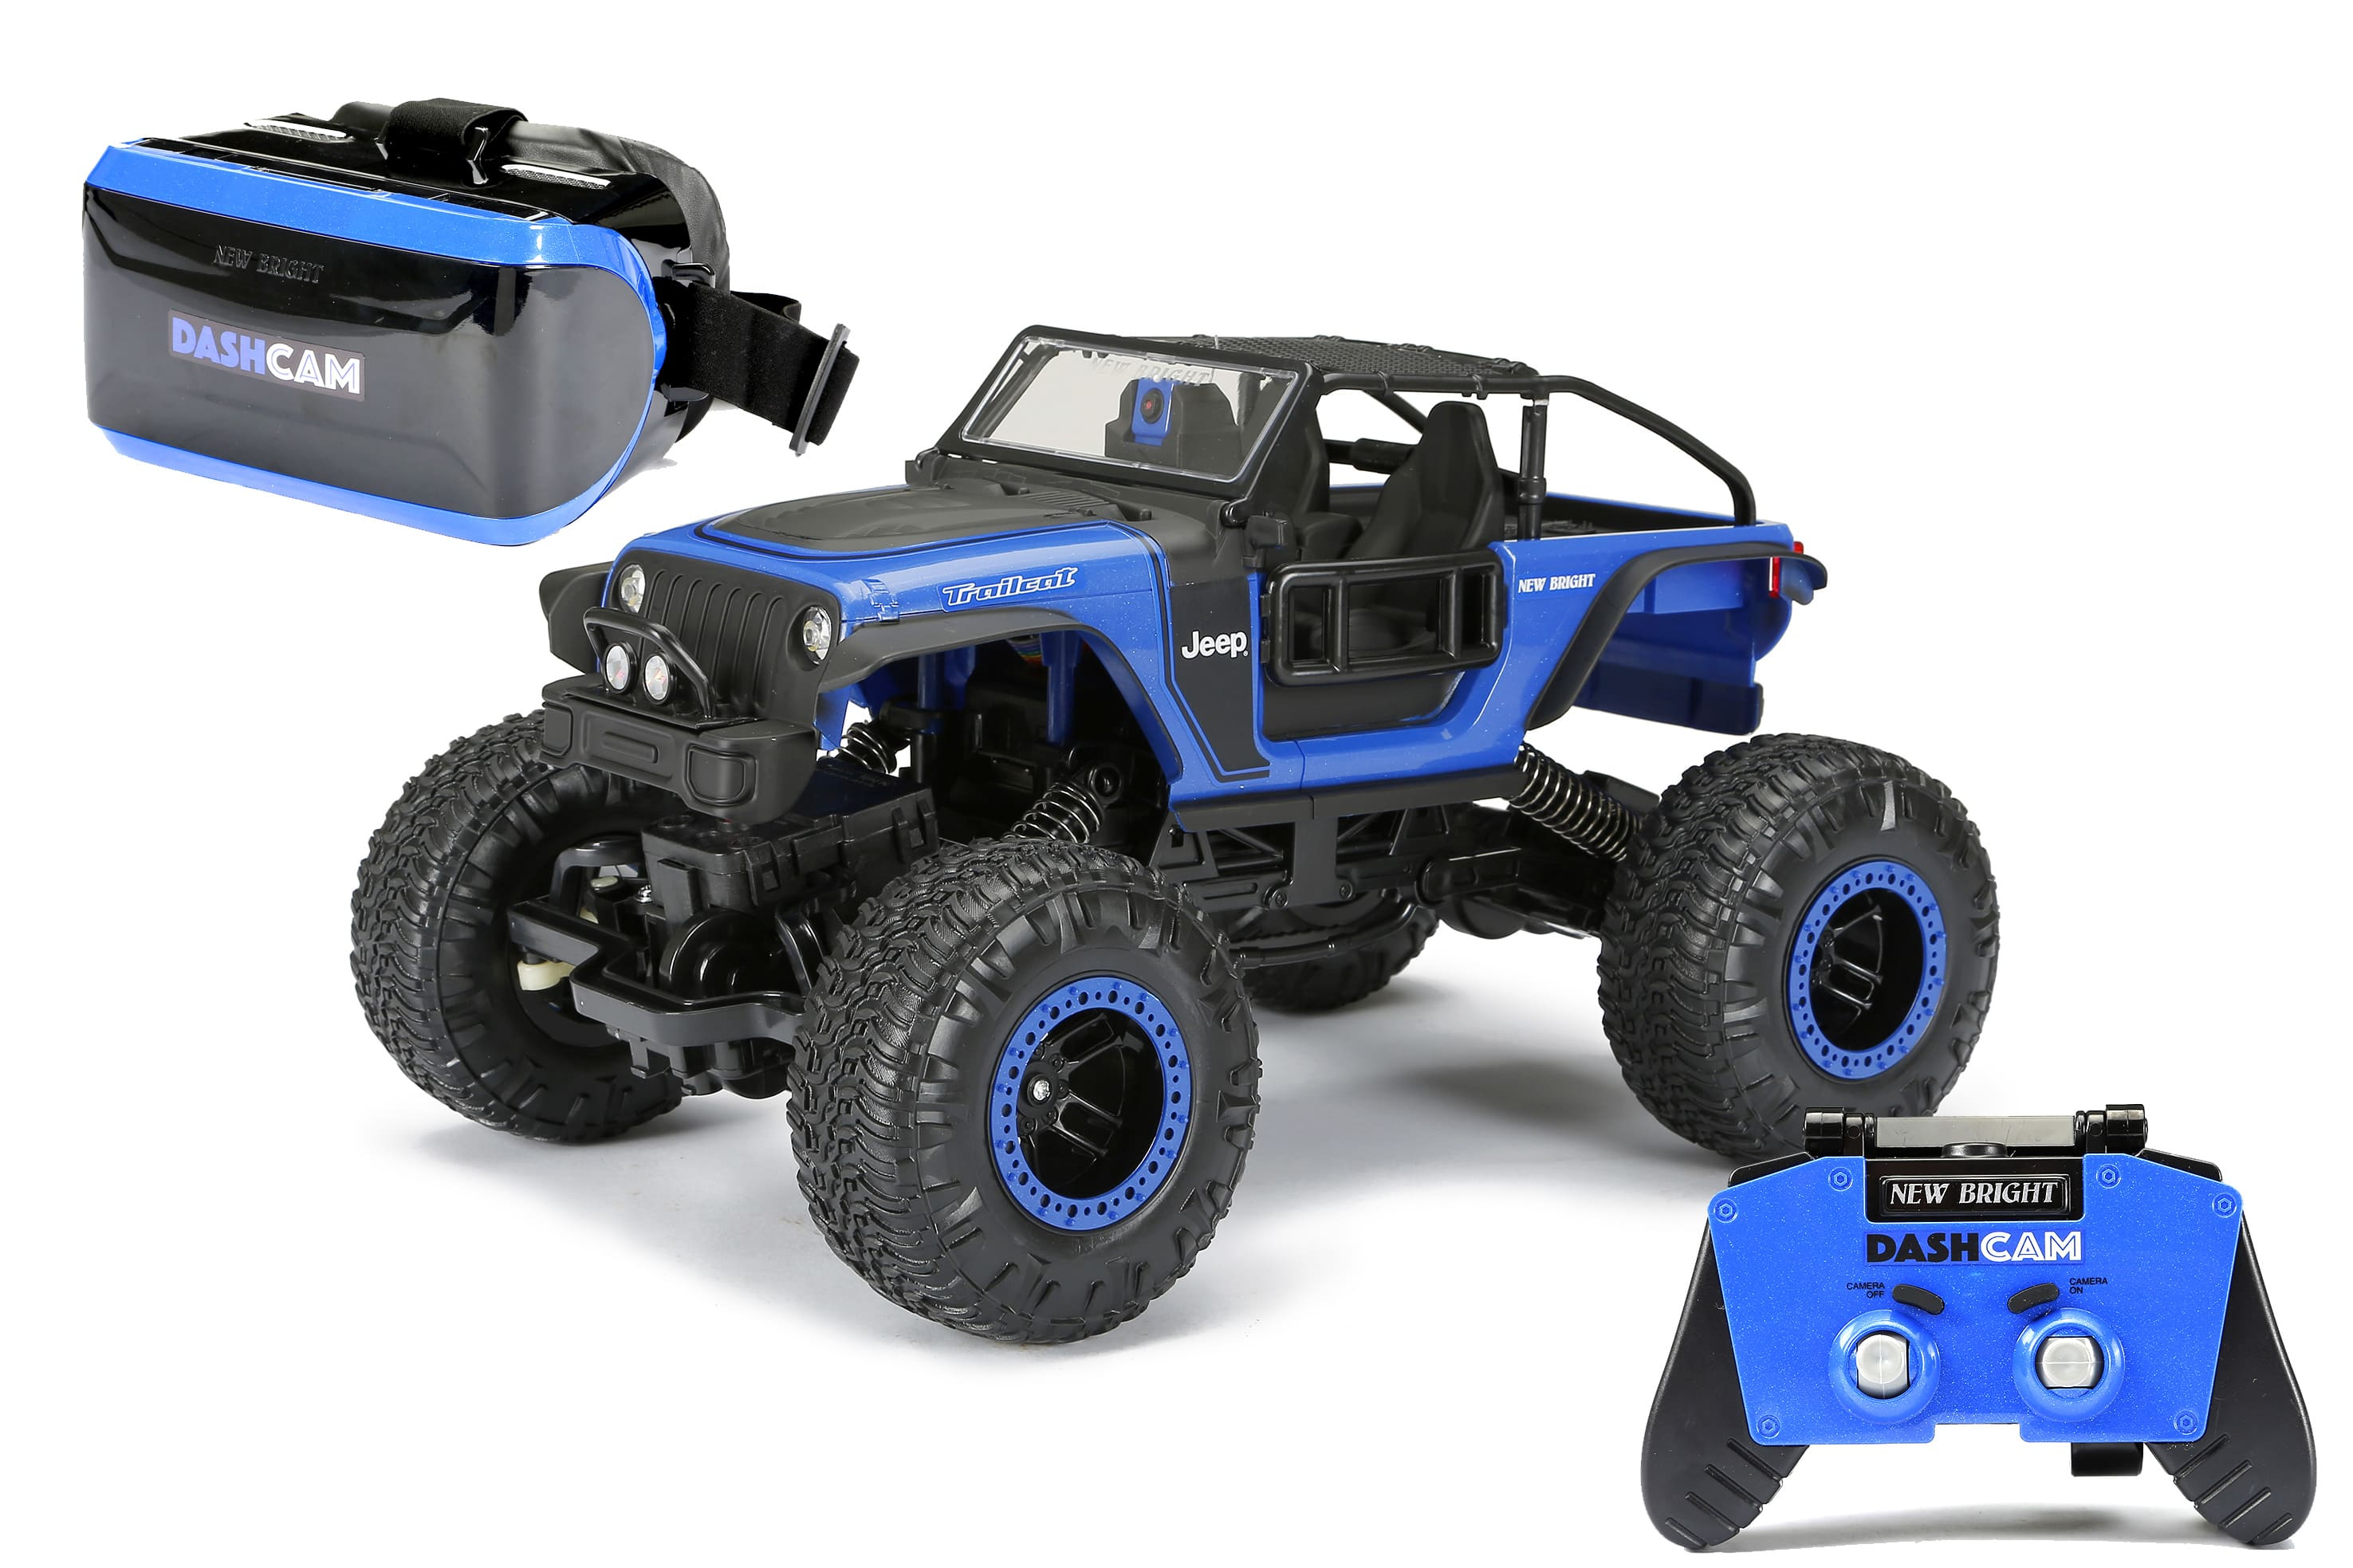 Bright RC Rock Crawler Jeep Trailcat w/ VR Dash Cam $13 (In Store) YMMV